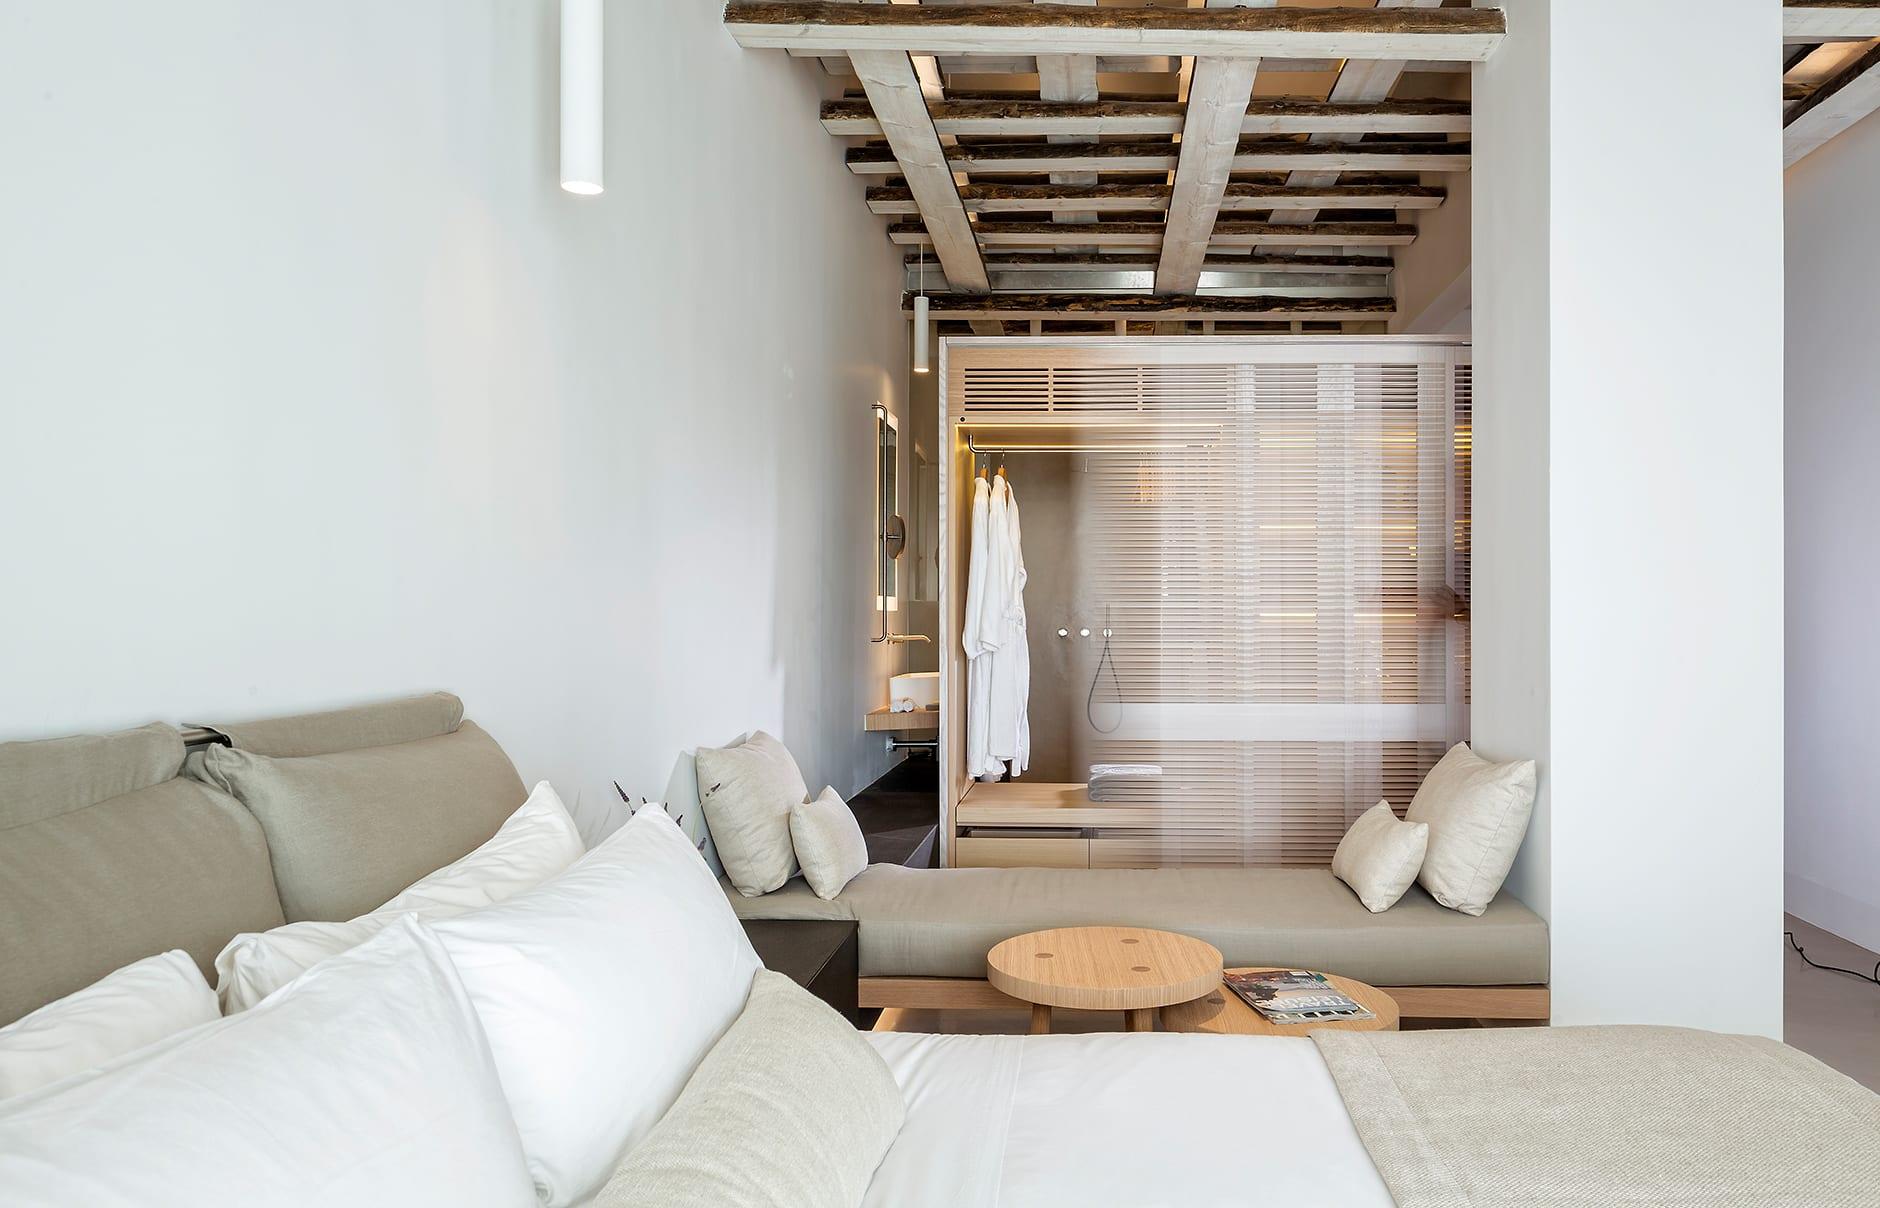 Bachelor Suite. Bill & Coo Mykonos. © Bill & Coo Mykonos